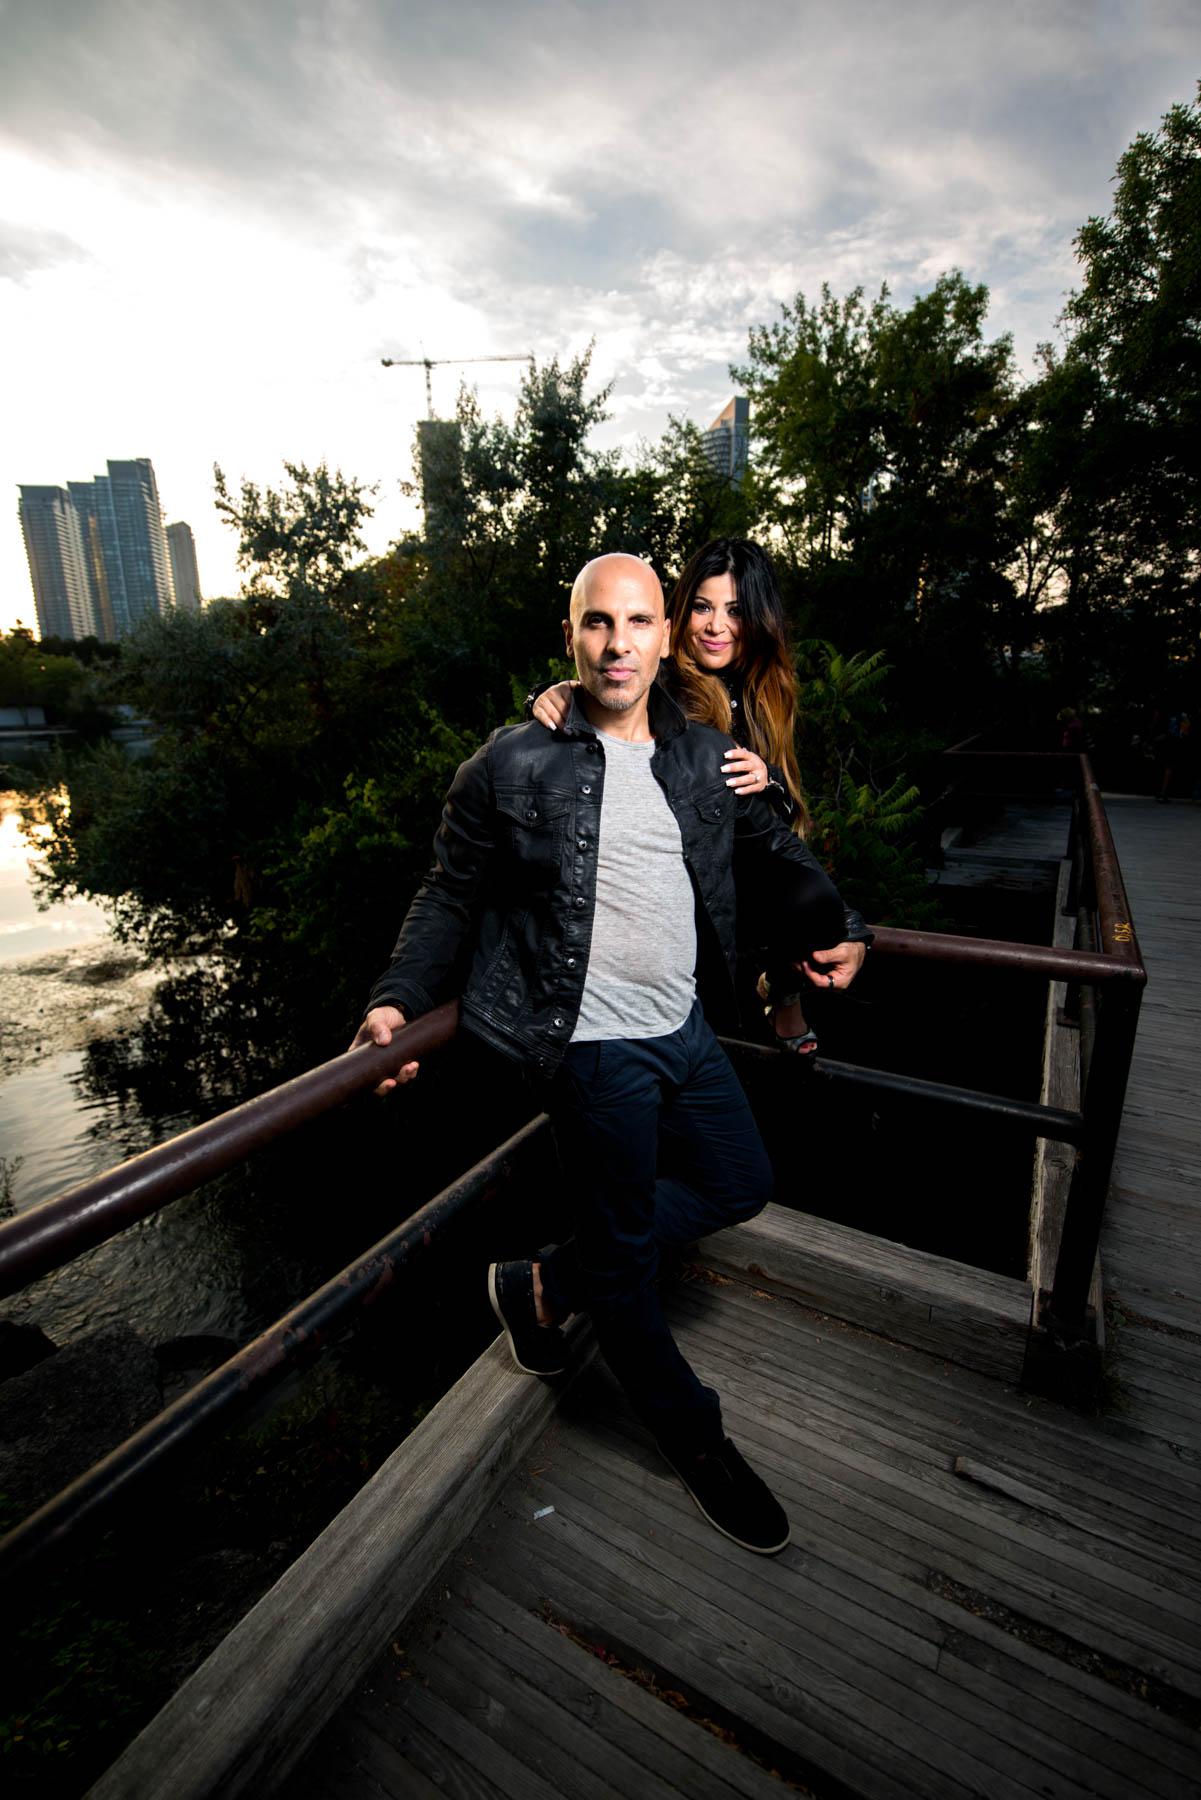 052 - Engagement FL Humber Bay Park - Toronto